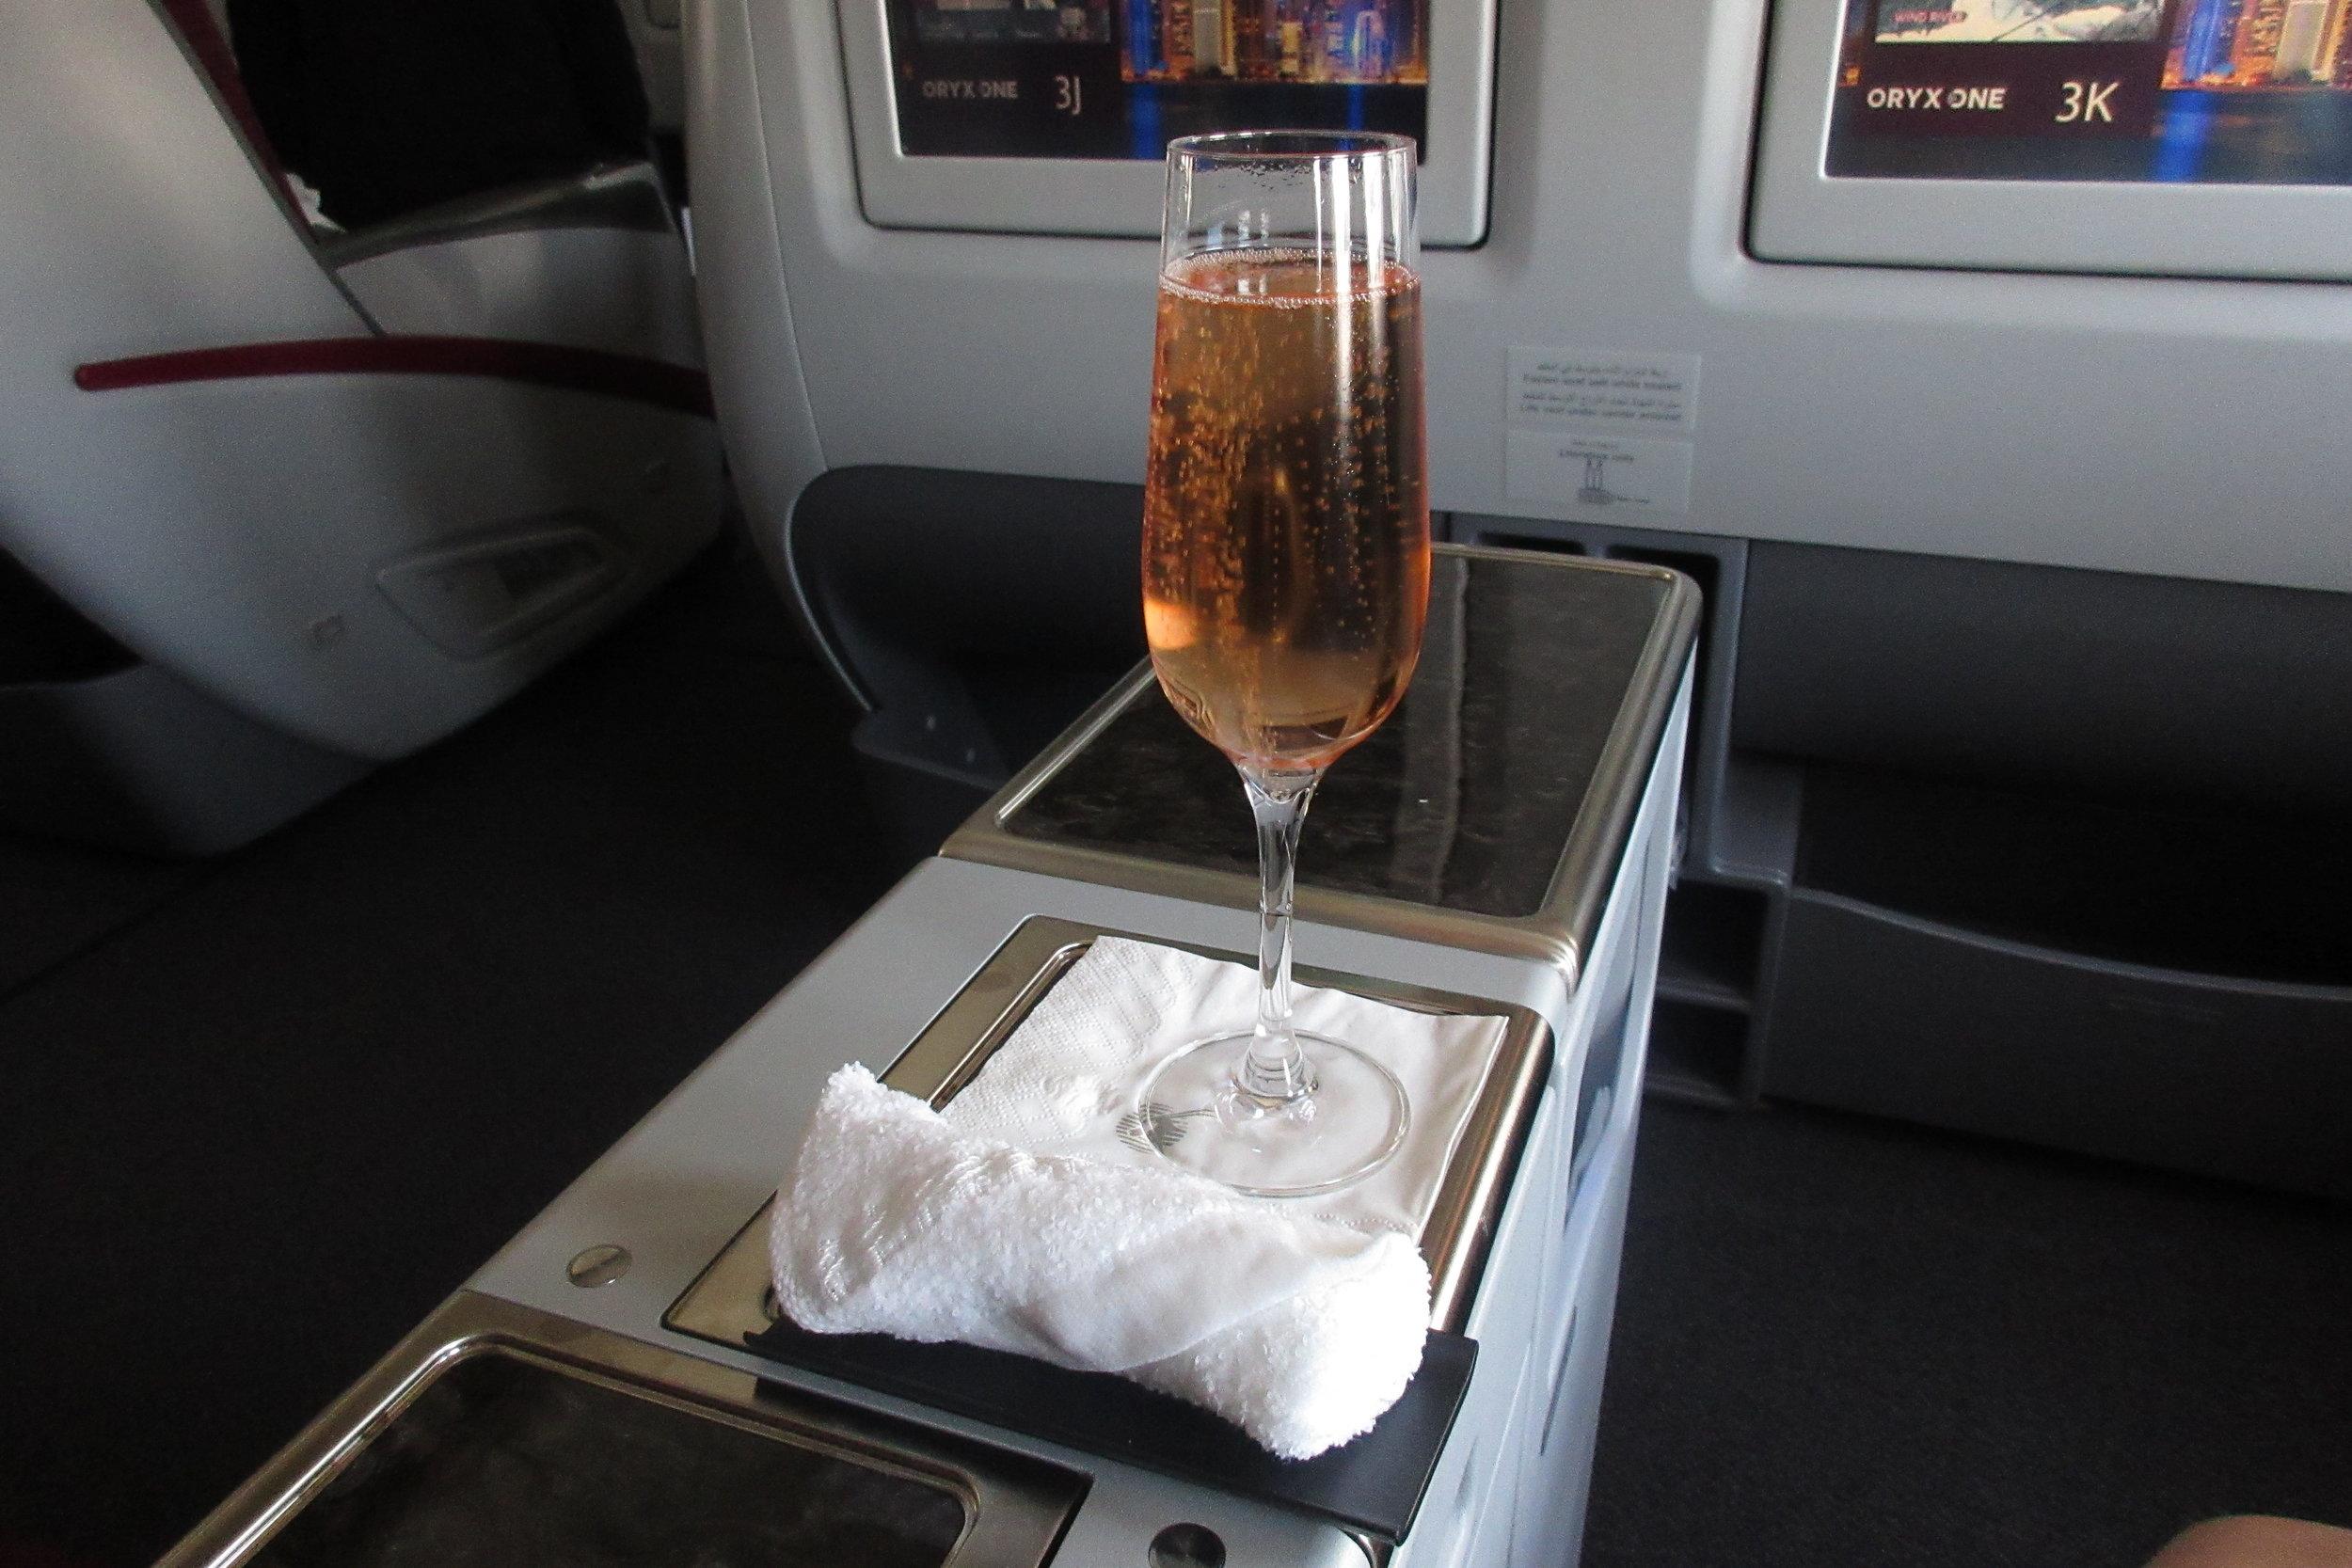 Qatar Airways 777 business class – Welcome champagne